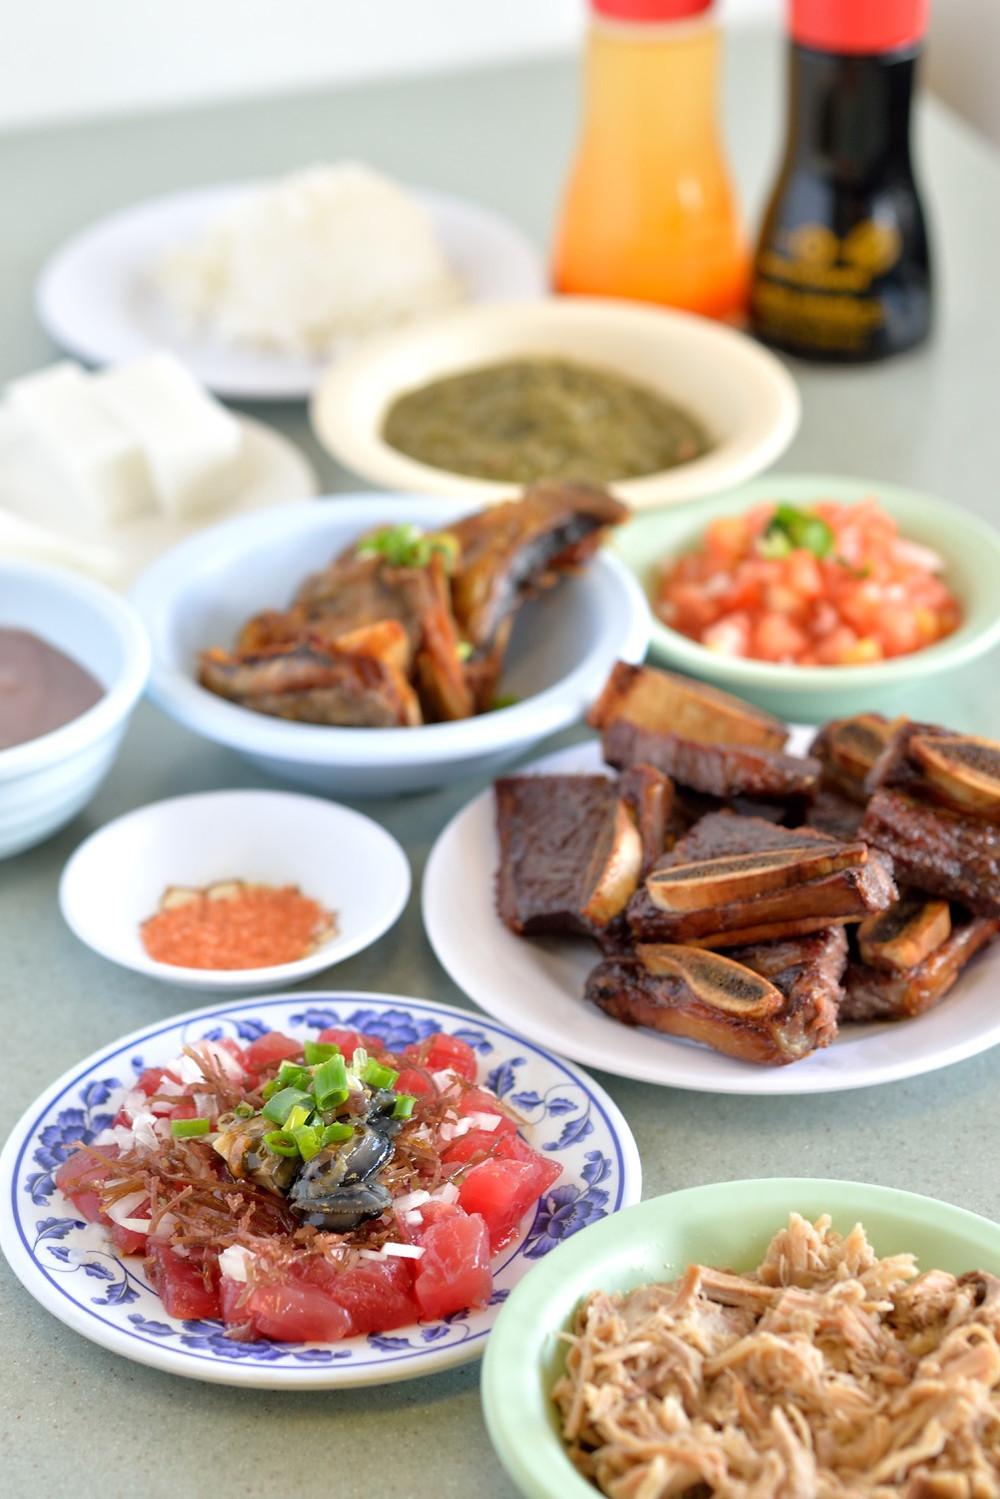 Helena's Hawaiian Foodはハワイアン料理の店。定番を組み合わせたセットメニューもあります(PHOTO / Tomohito Ishimaru)